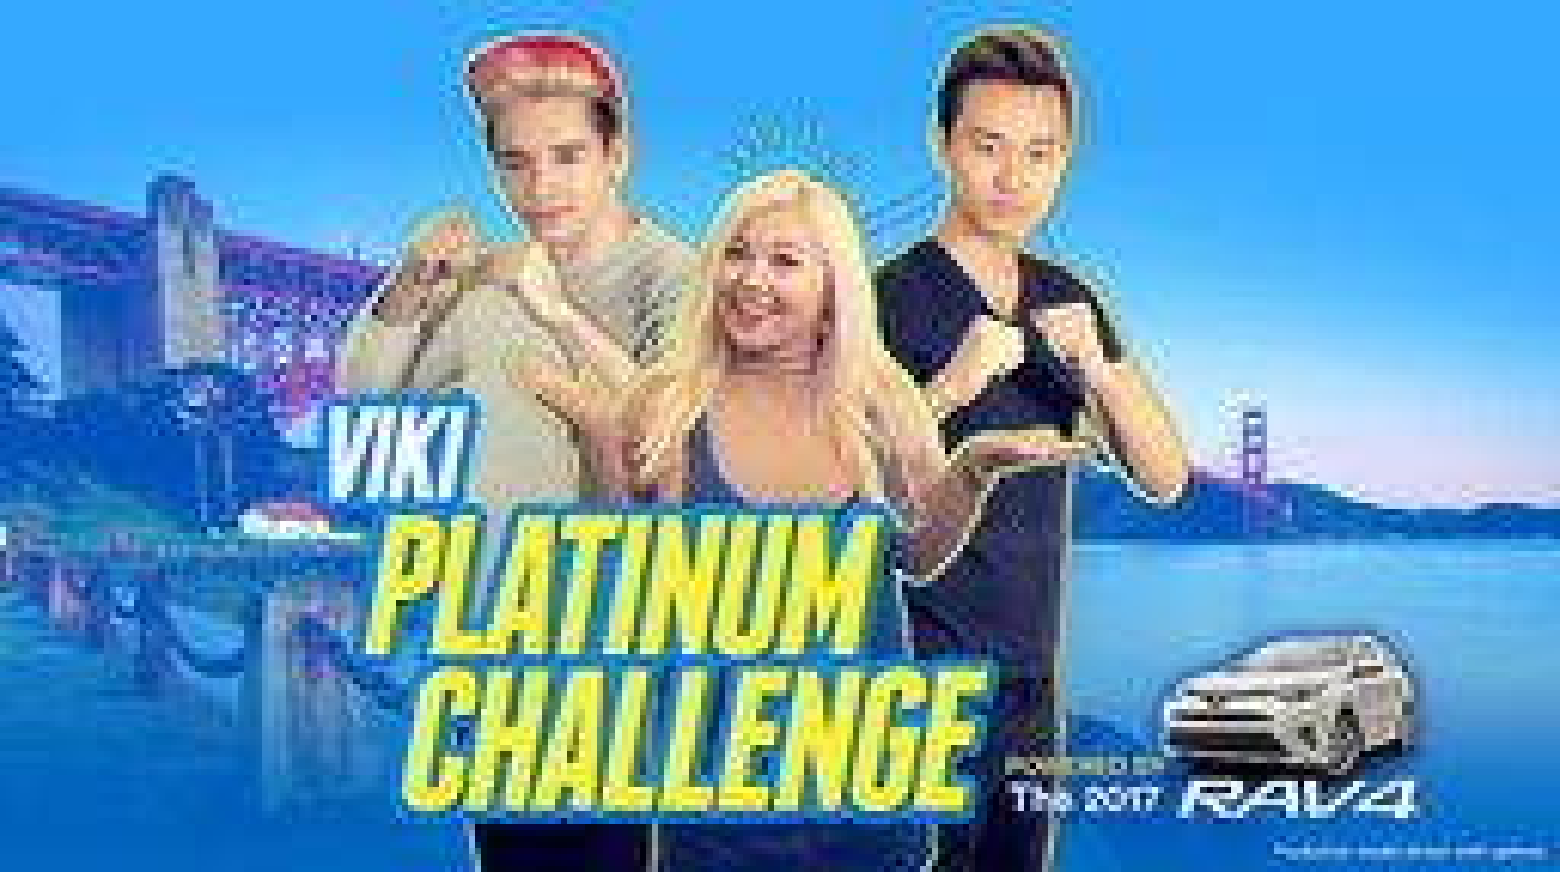 Viki Platinum Challenge Powered by the 2017 Toyota RAV4